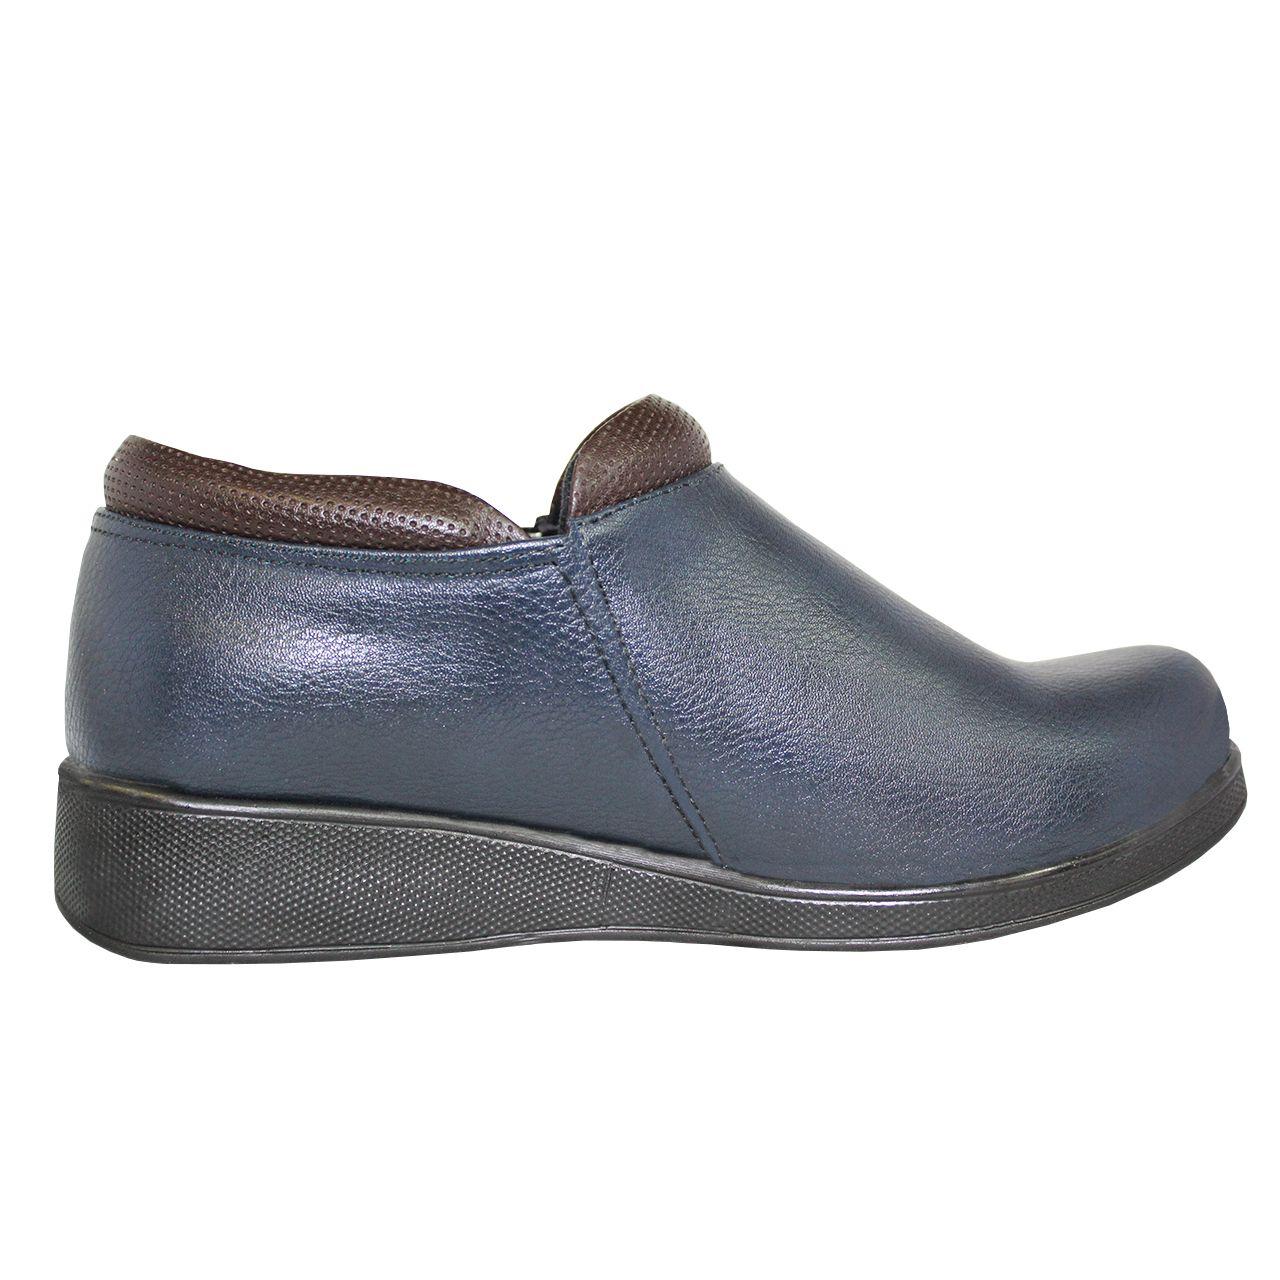 کفش روزمره زنانه لیانا کد 362-S -  - 1